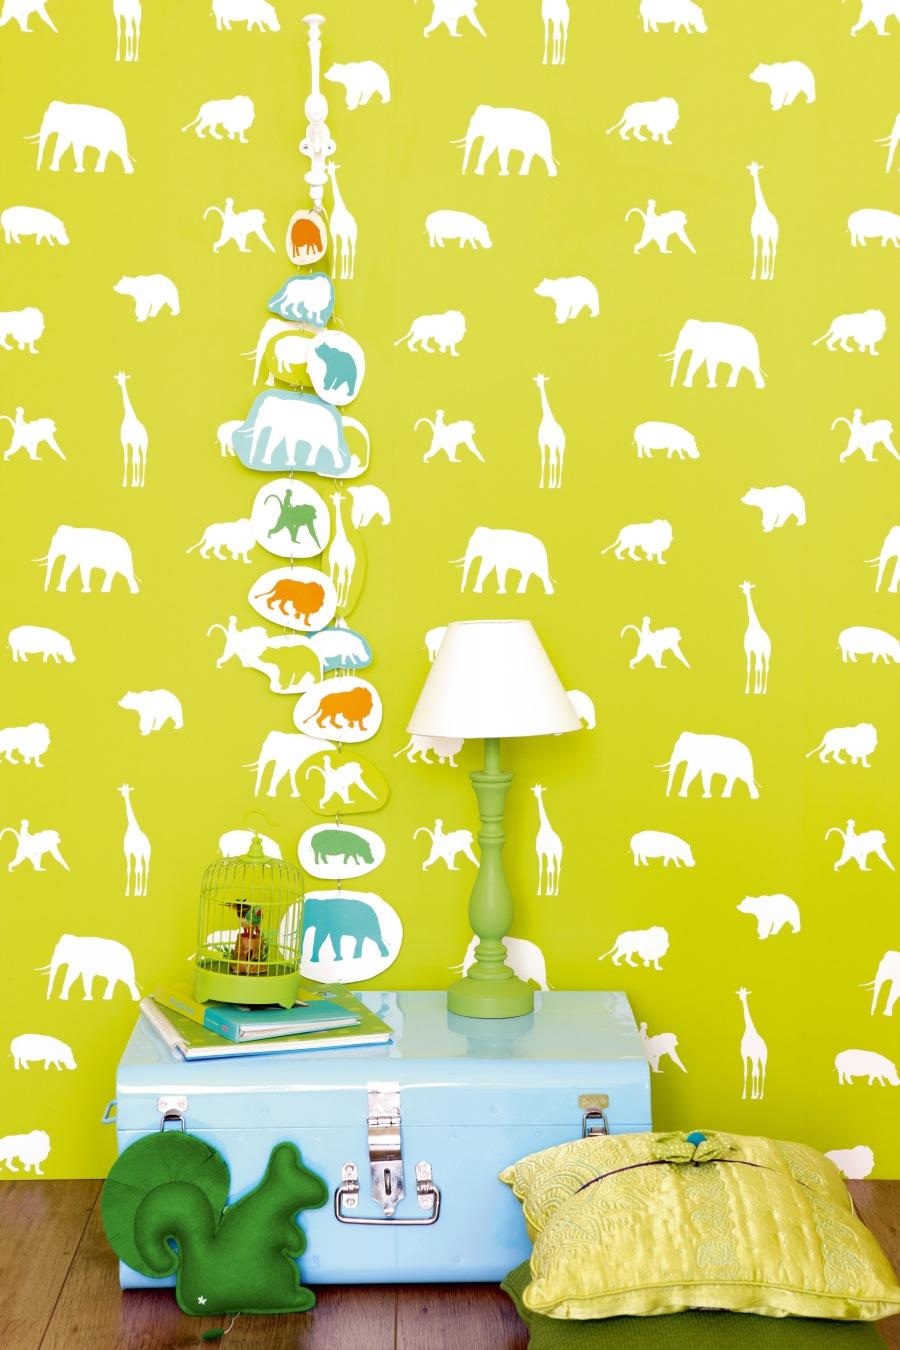 Papeles pintados con animales - Villalba Interiorirsmo